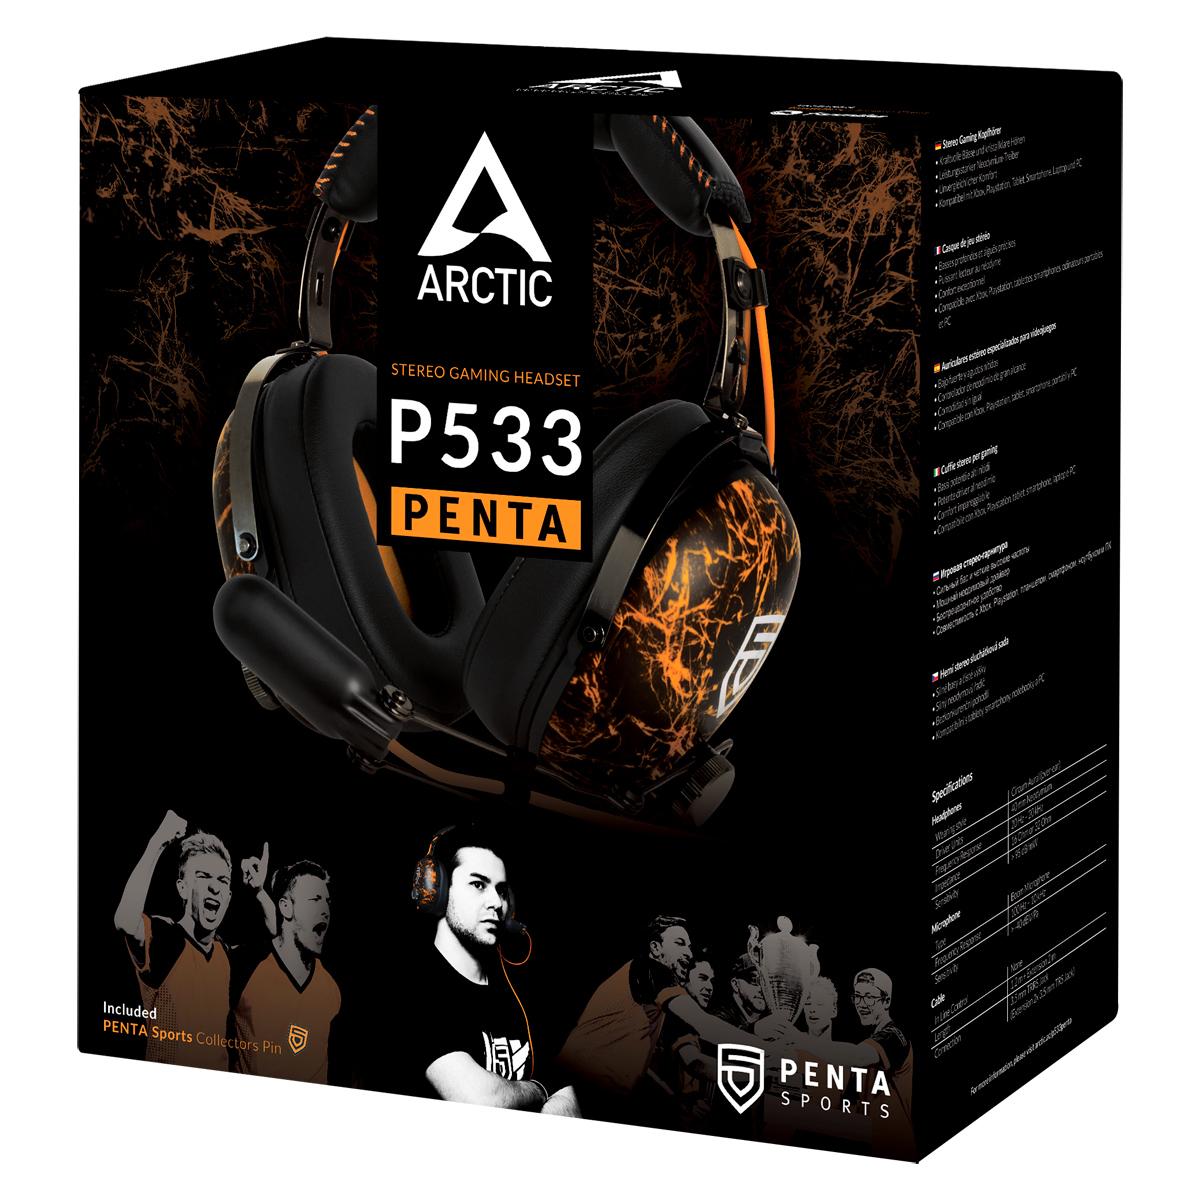 P533 Penta